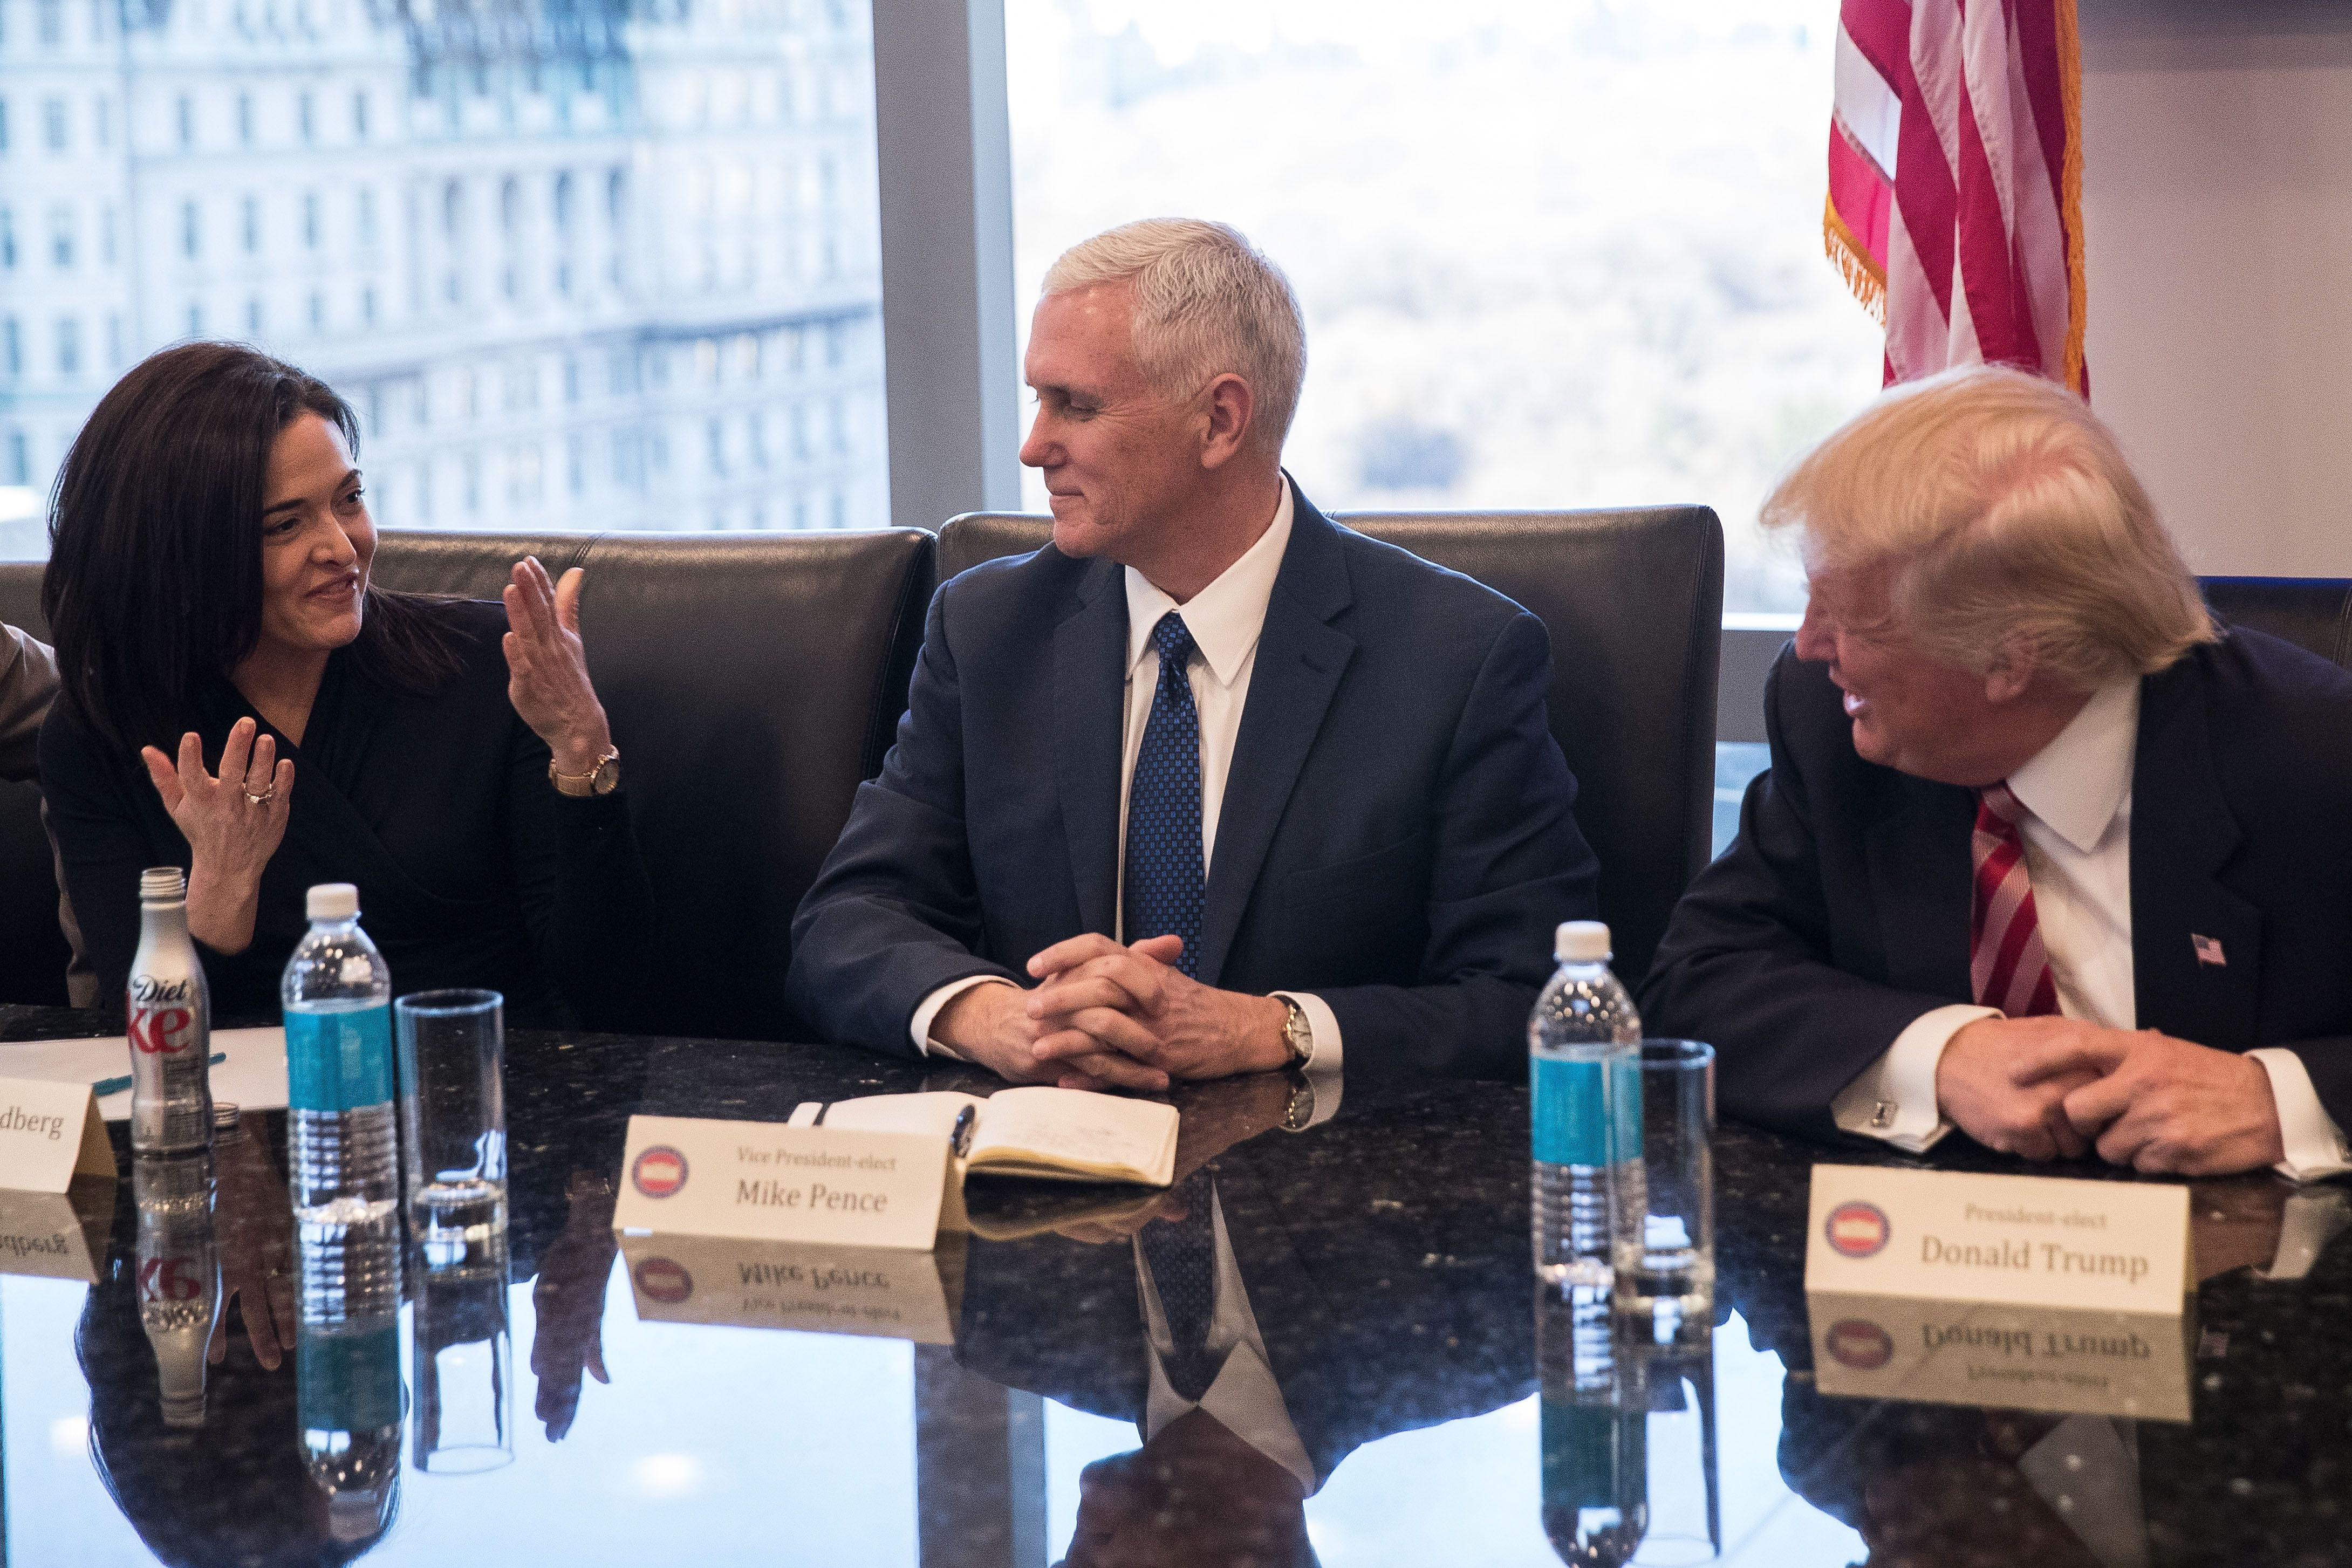 Sheryl Sandberg has the ear of Vice President Mike Pence and President Donald Trump.